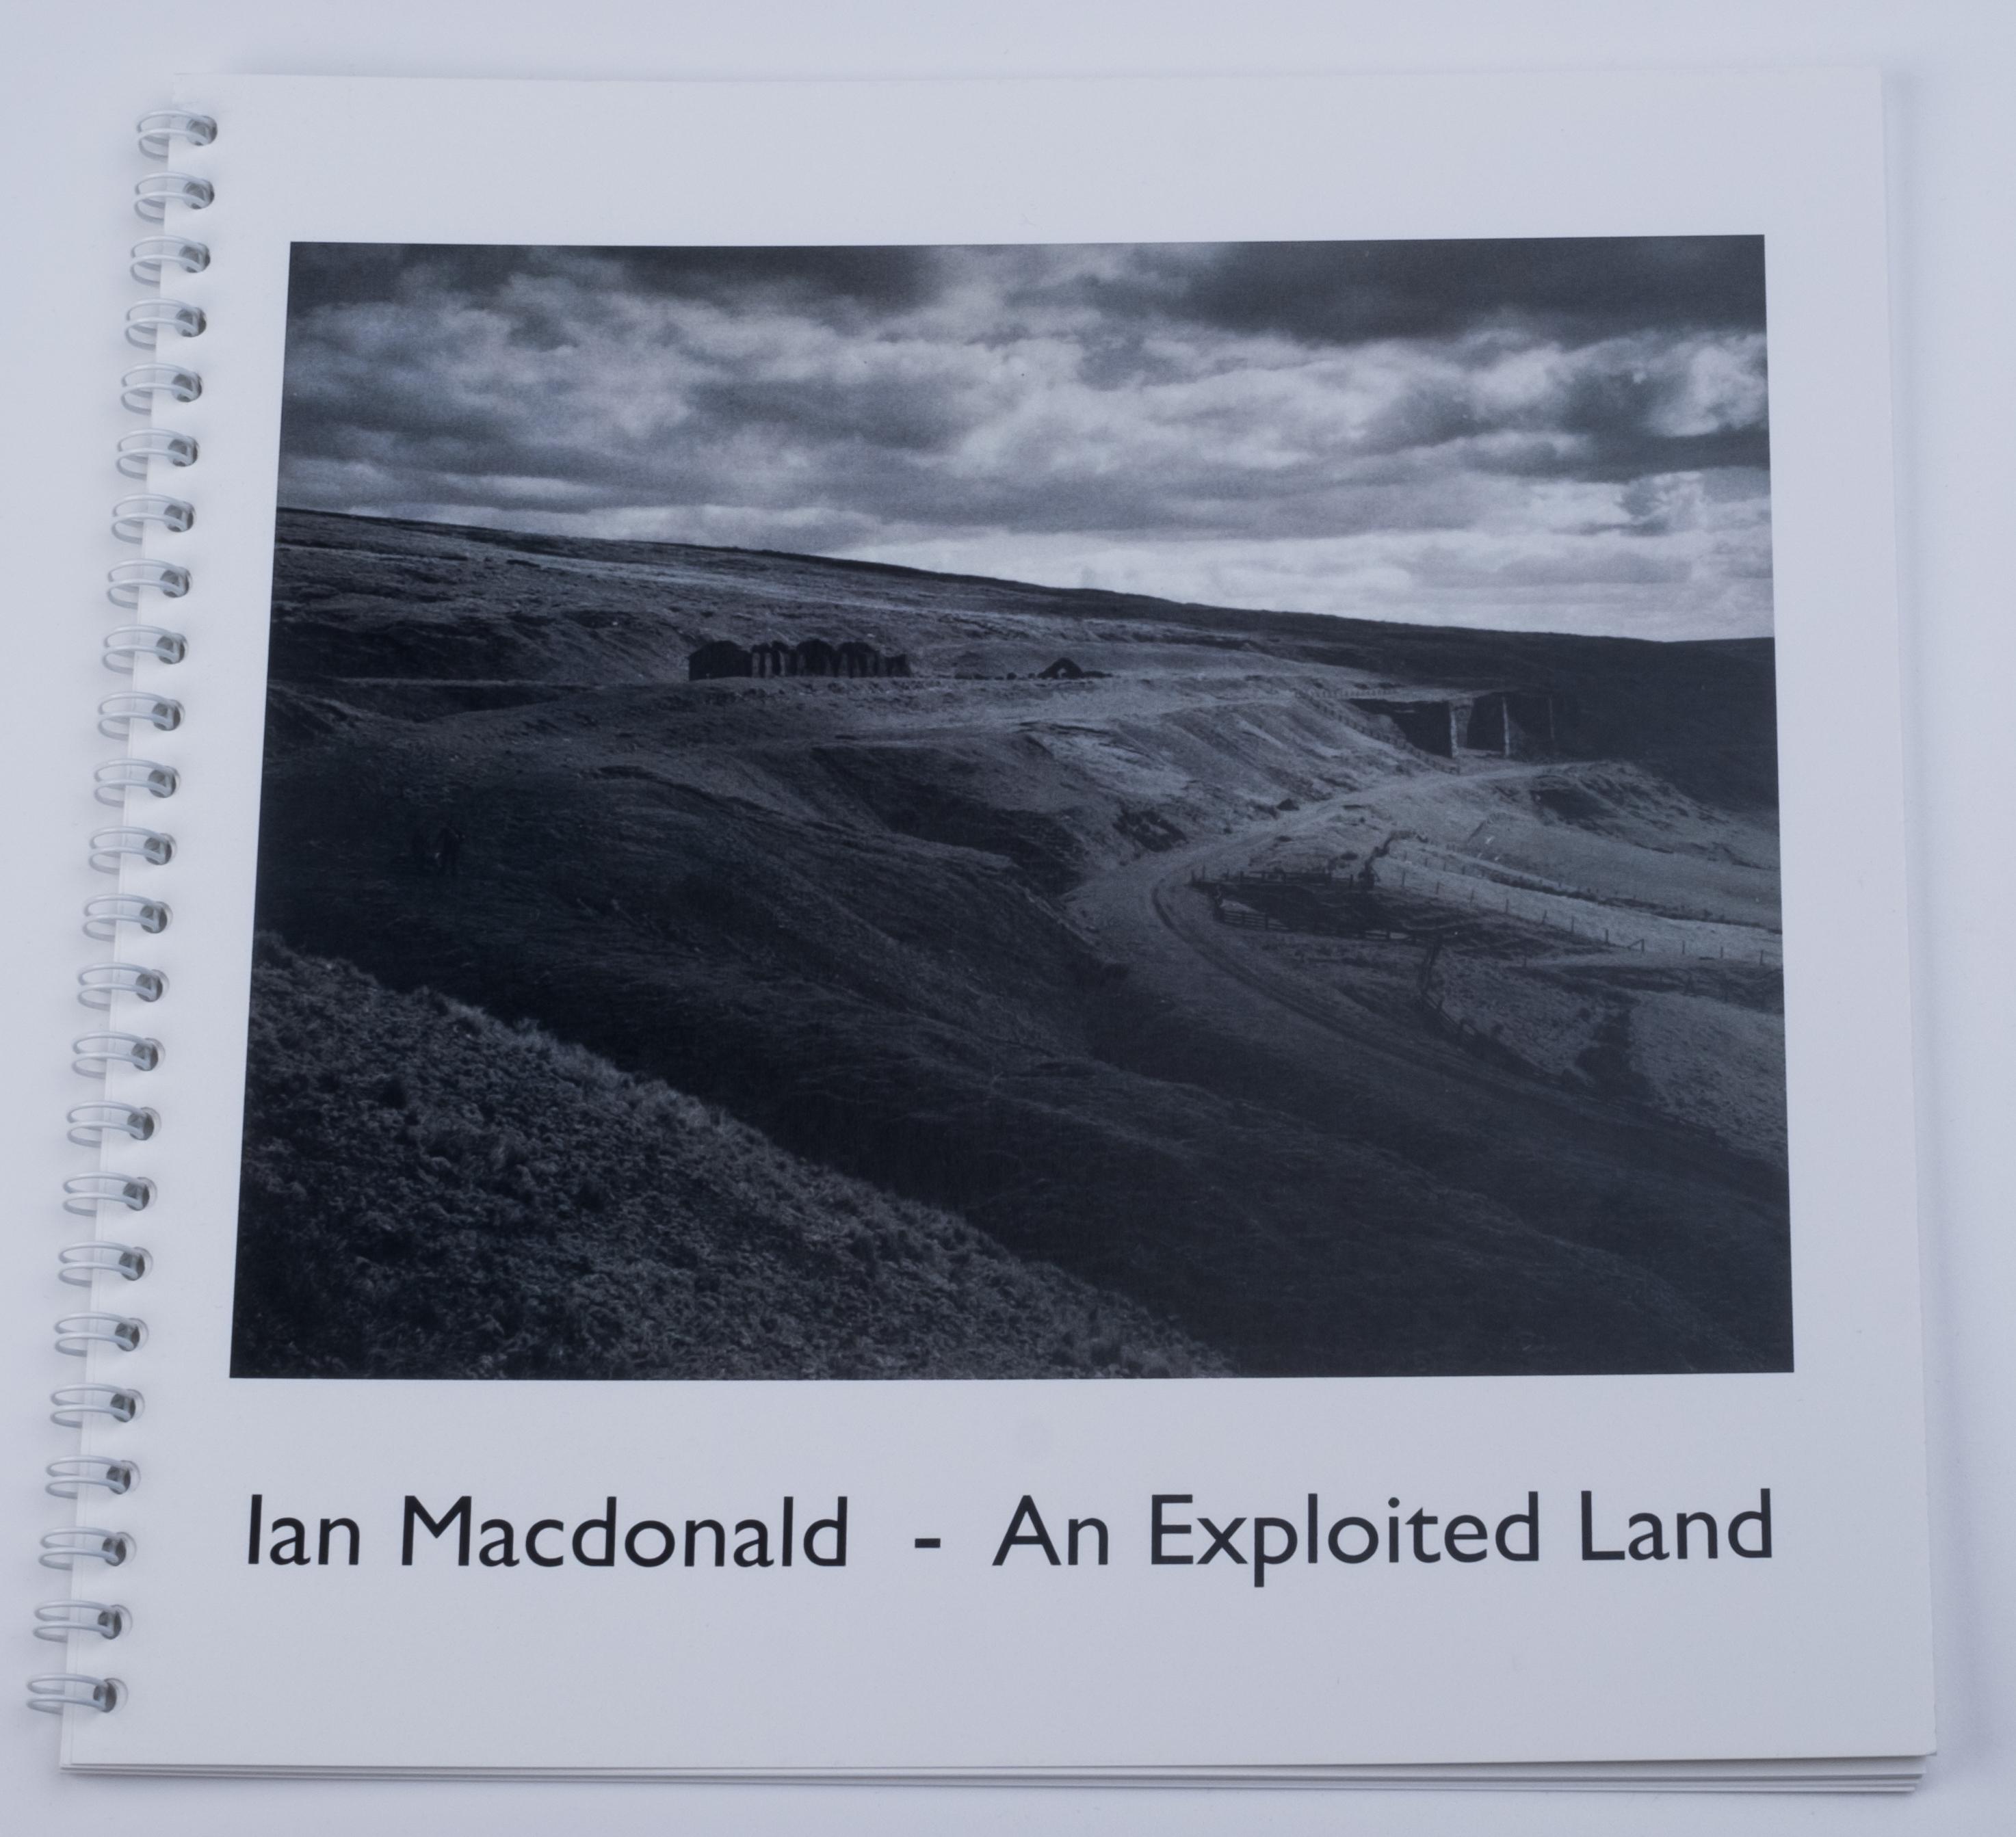 IAN MCDONALD - An Exploited Land